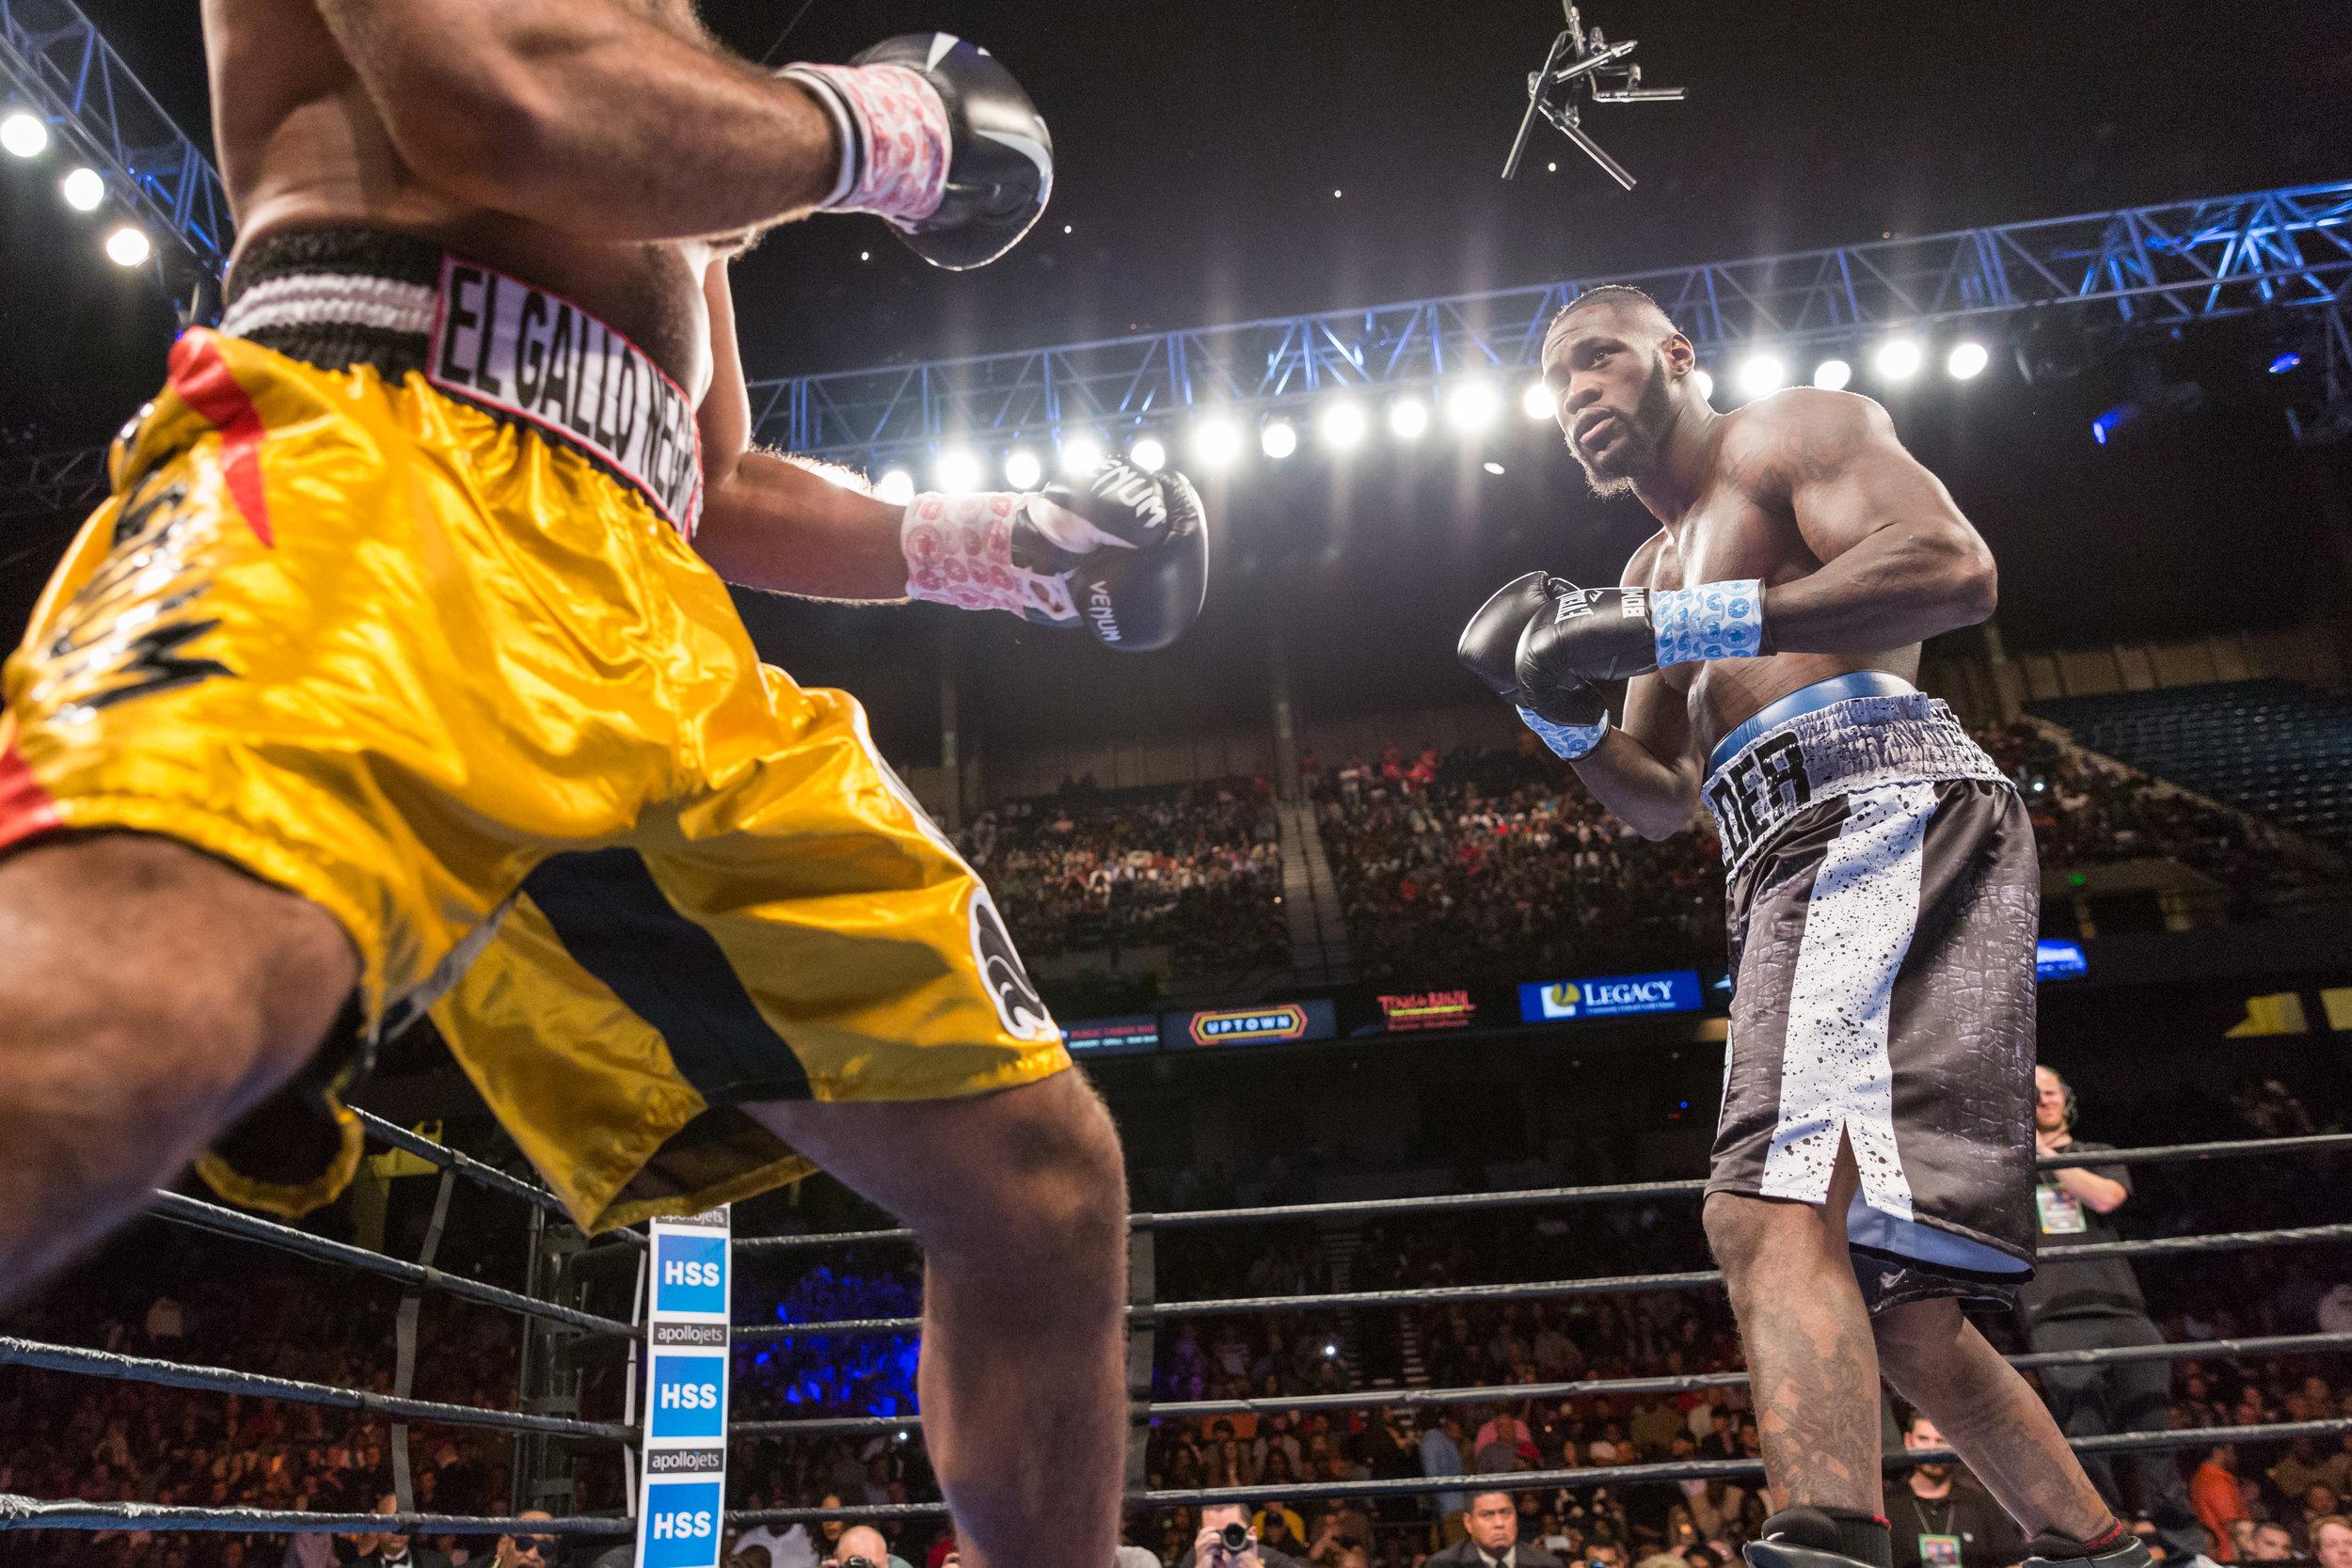 Deontay Wilder vs Gerald Washington - February 25_ 2017_02_25_2017_Fight_Ryan Hafey _ Premier Boxing Champions3.jpg